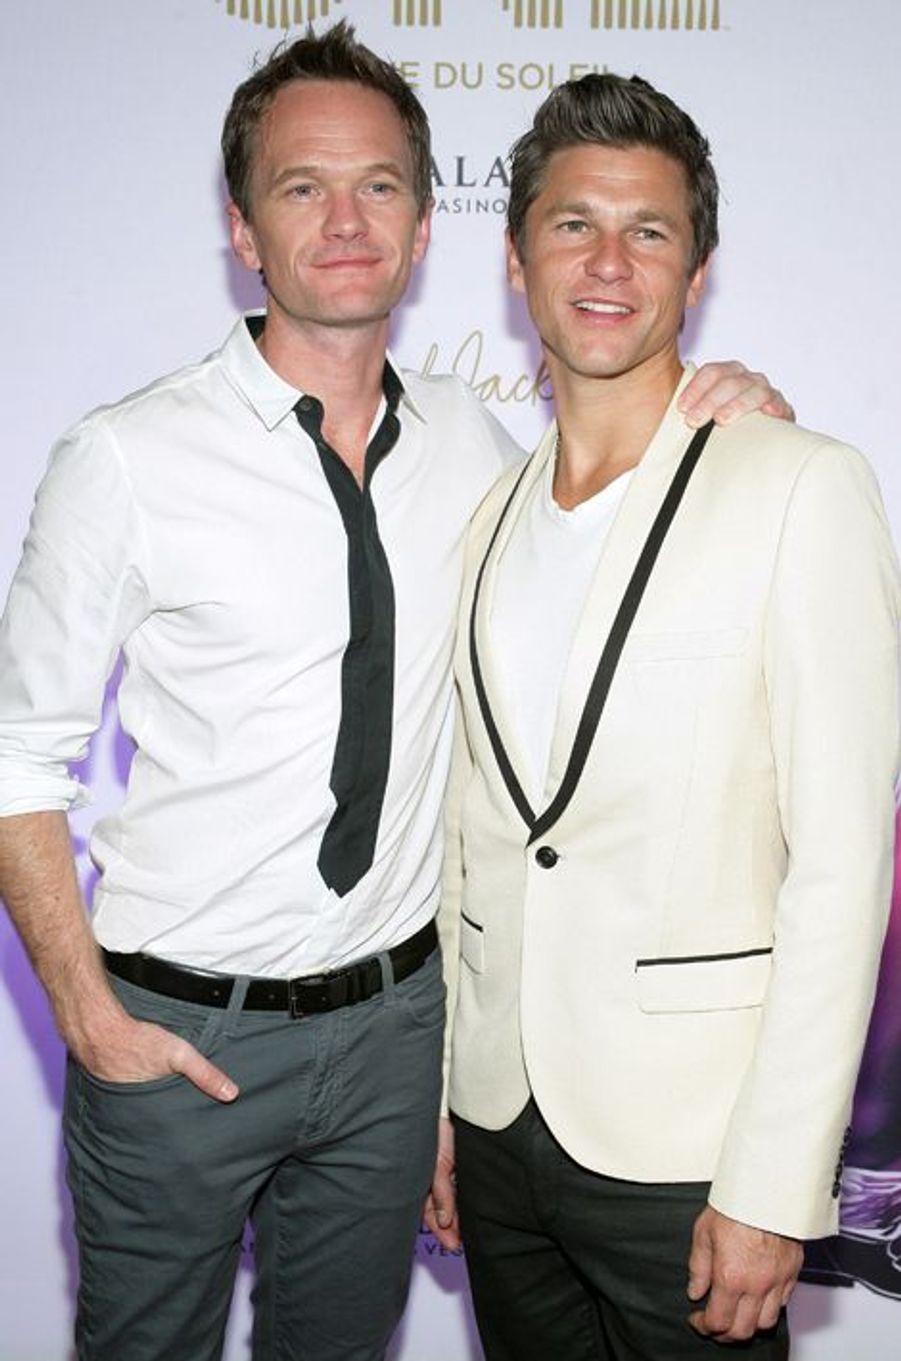 David Burtka et Neil Patrick Harris à Las Vegas, le 29 juin 2013.